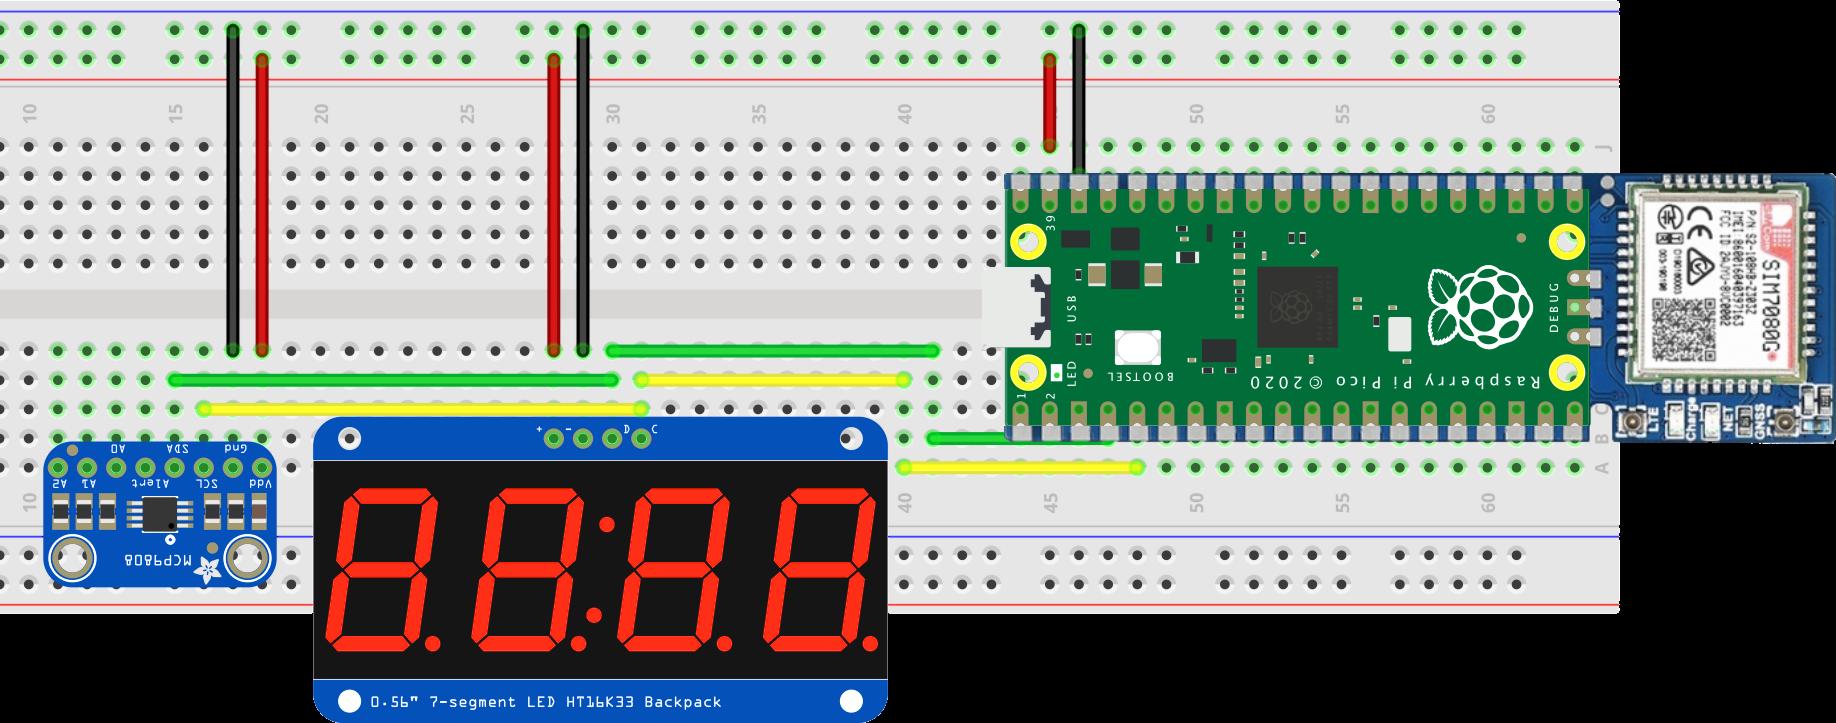 The Waveshare Pico sensor circuit layout